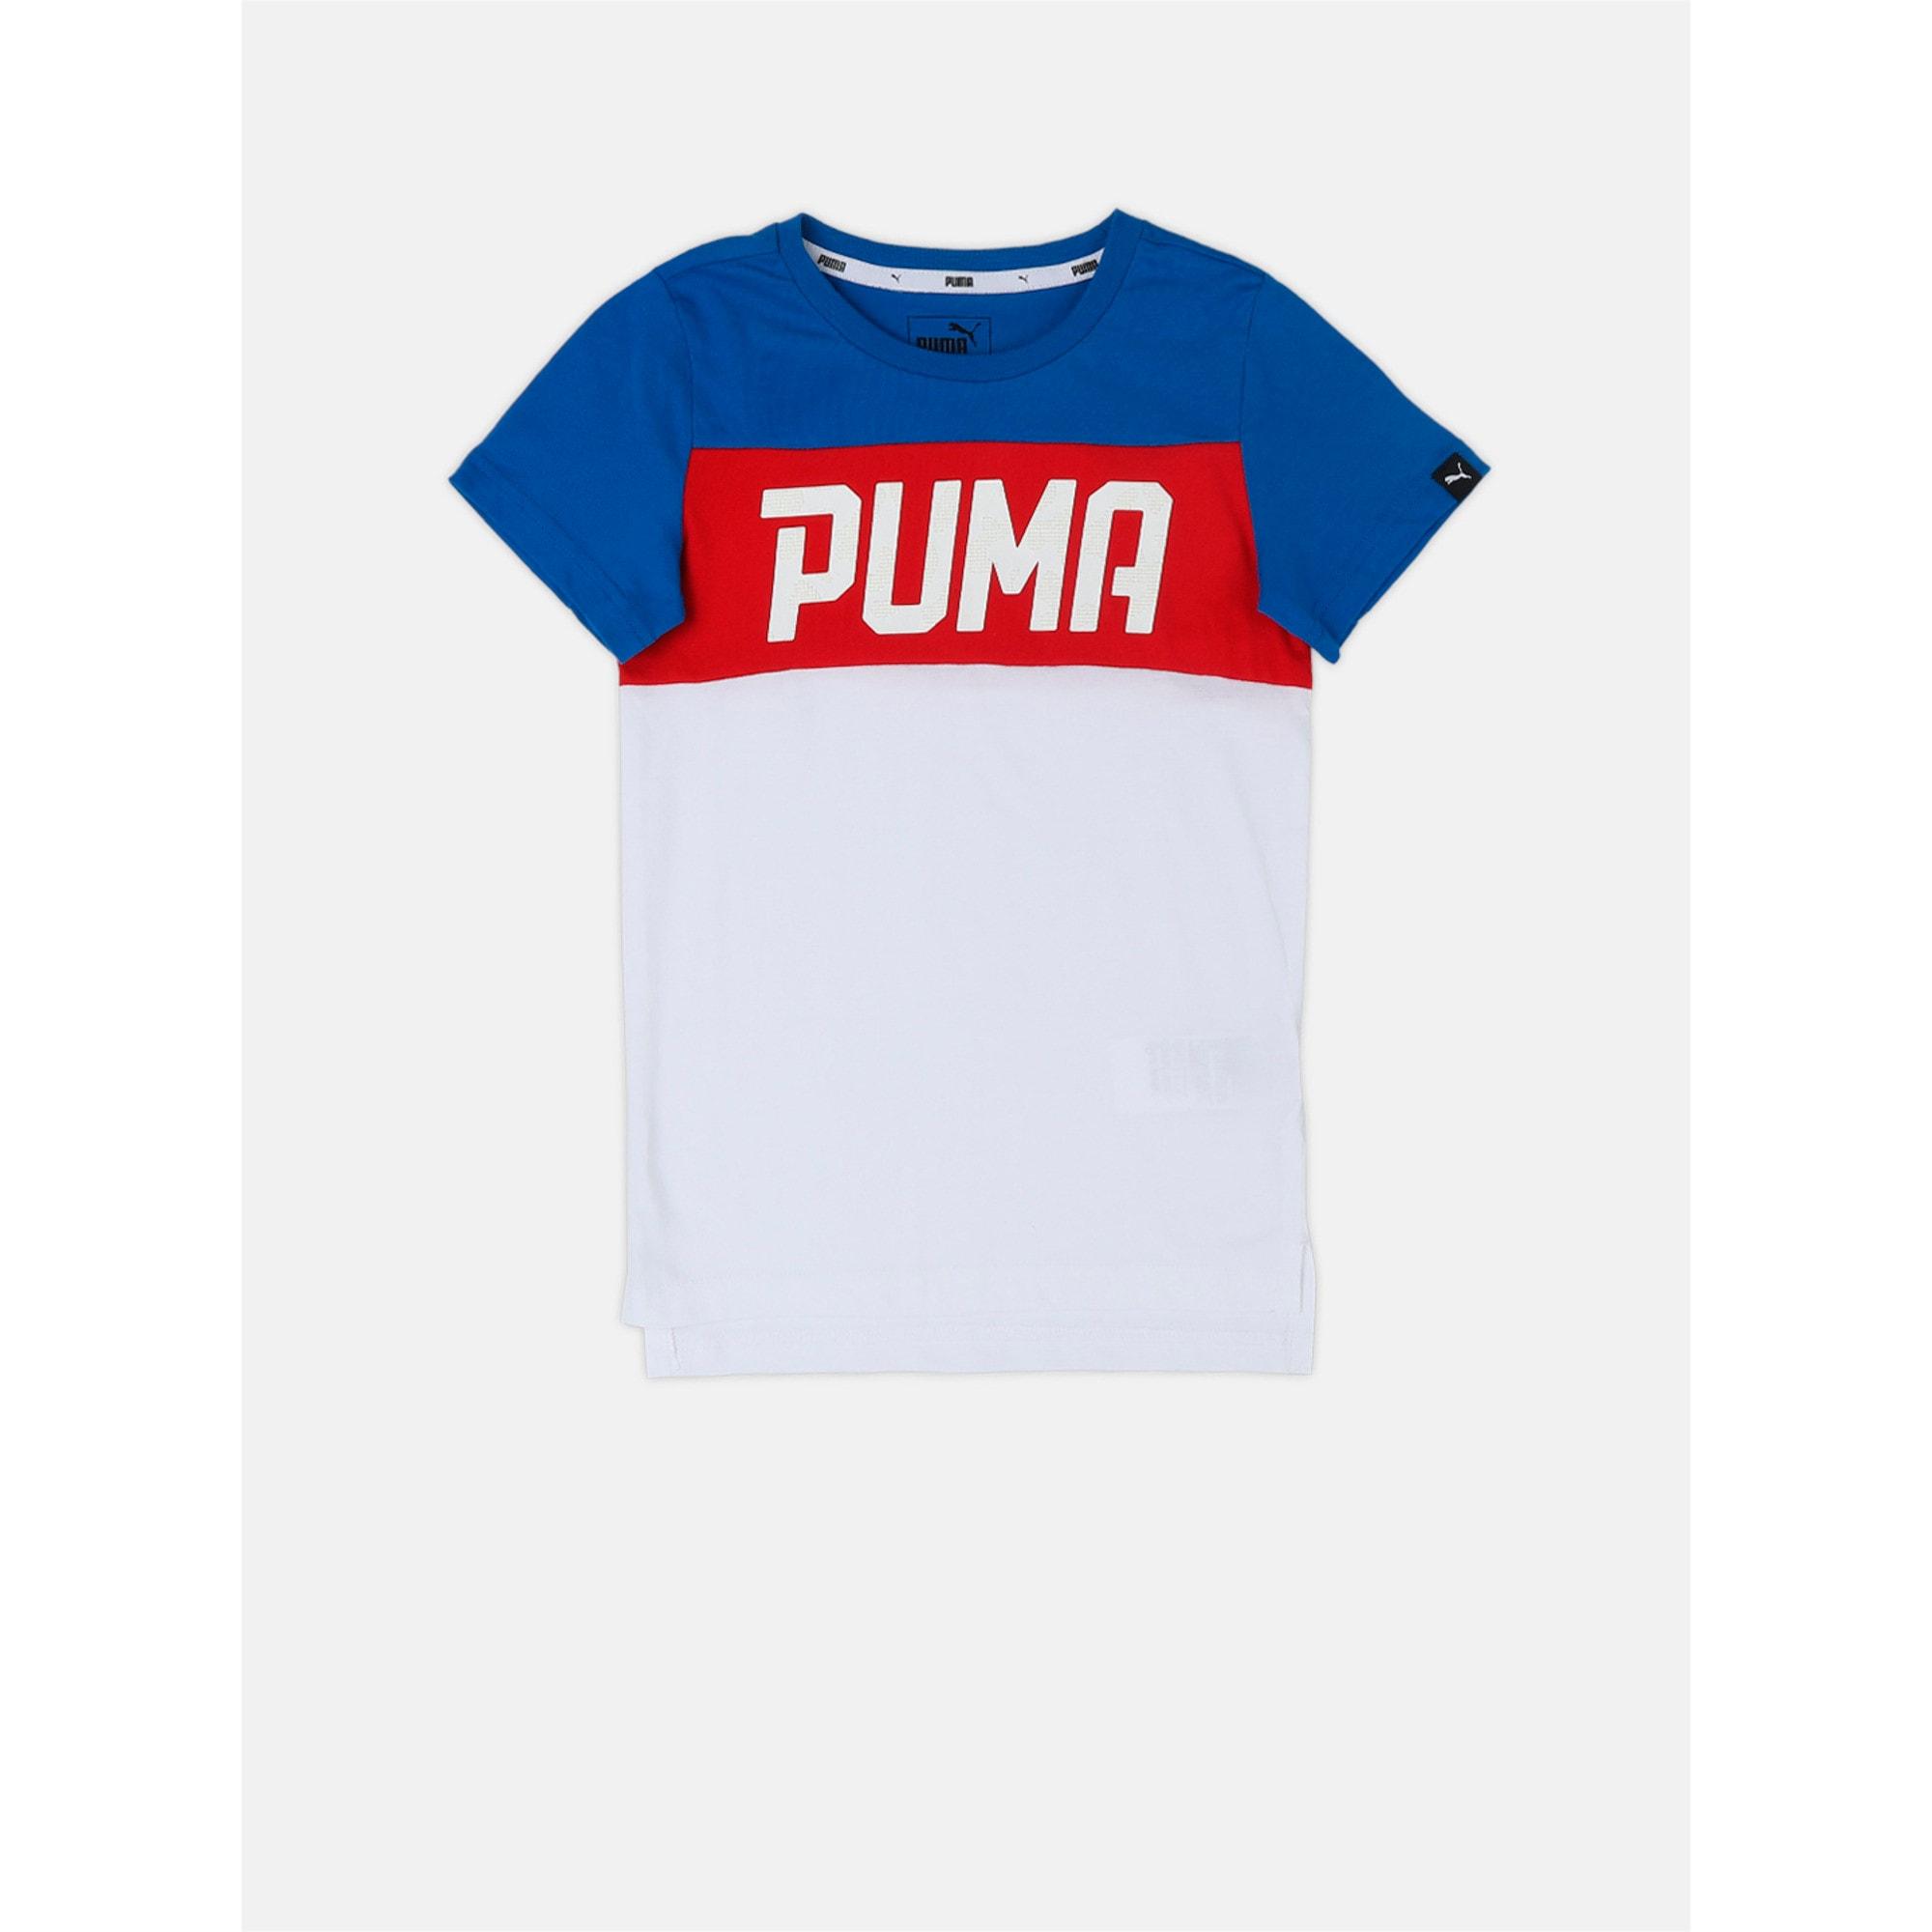 Thumbnail 2 of Boys' T-Shirt, Puma White, medium-IND